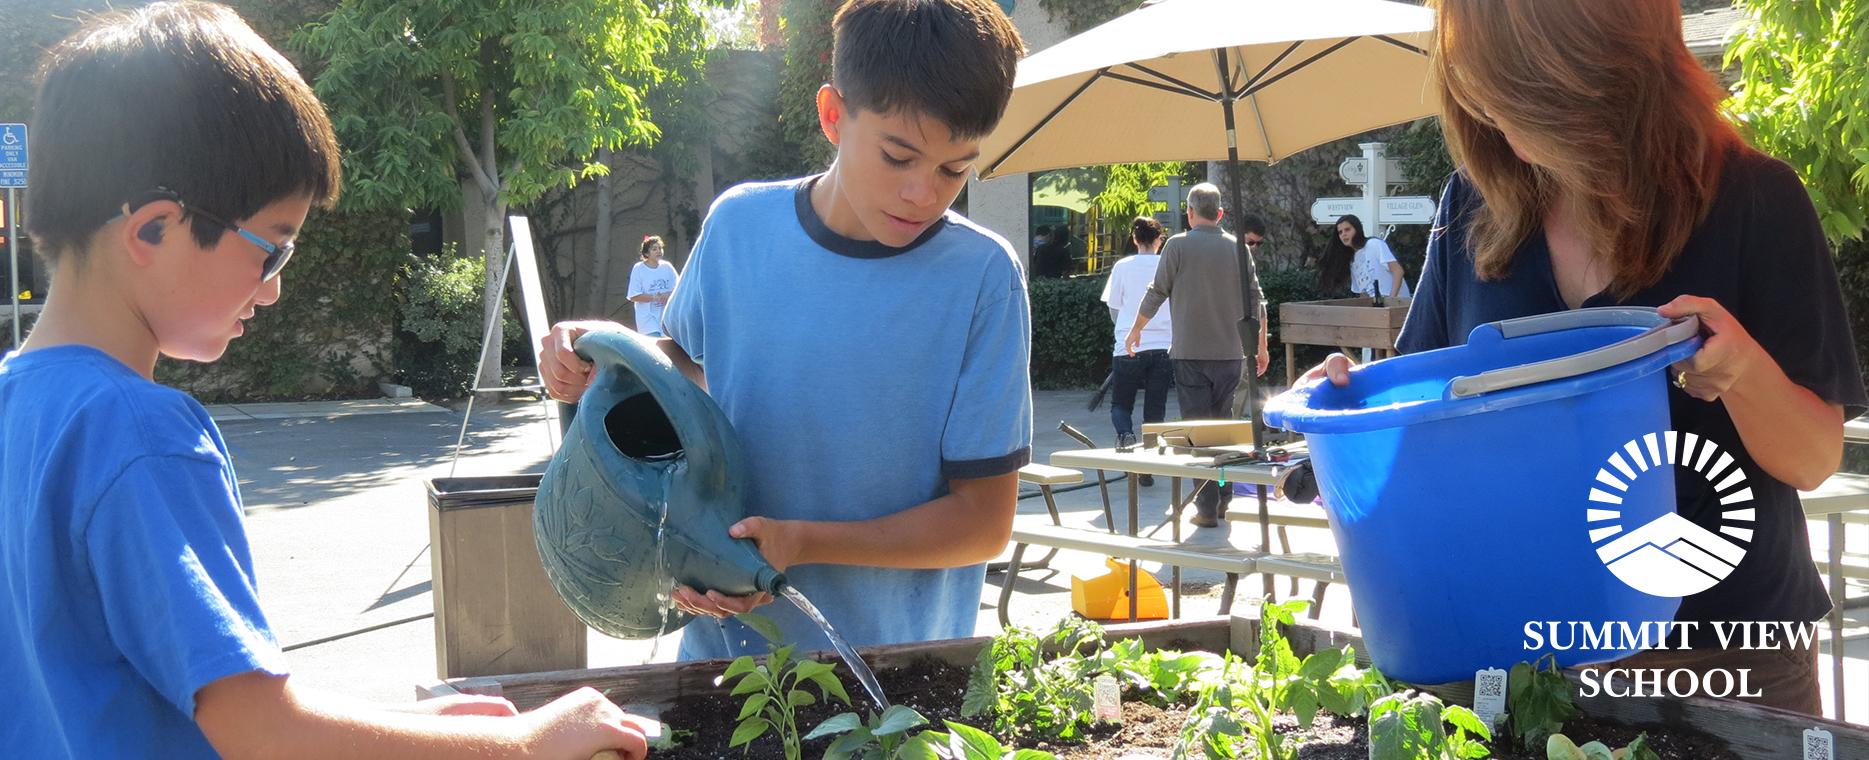 SV_sliders_gardening_1869x760px